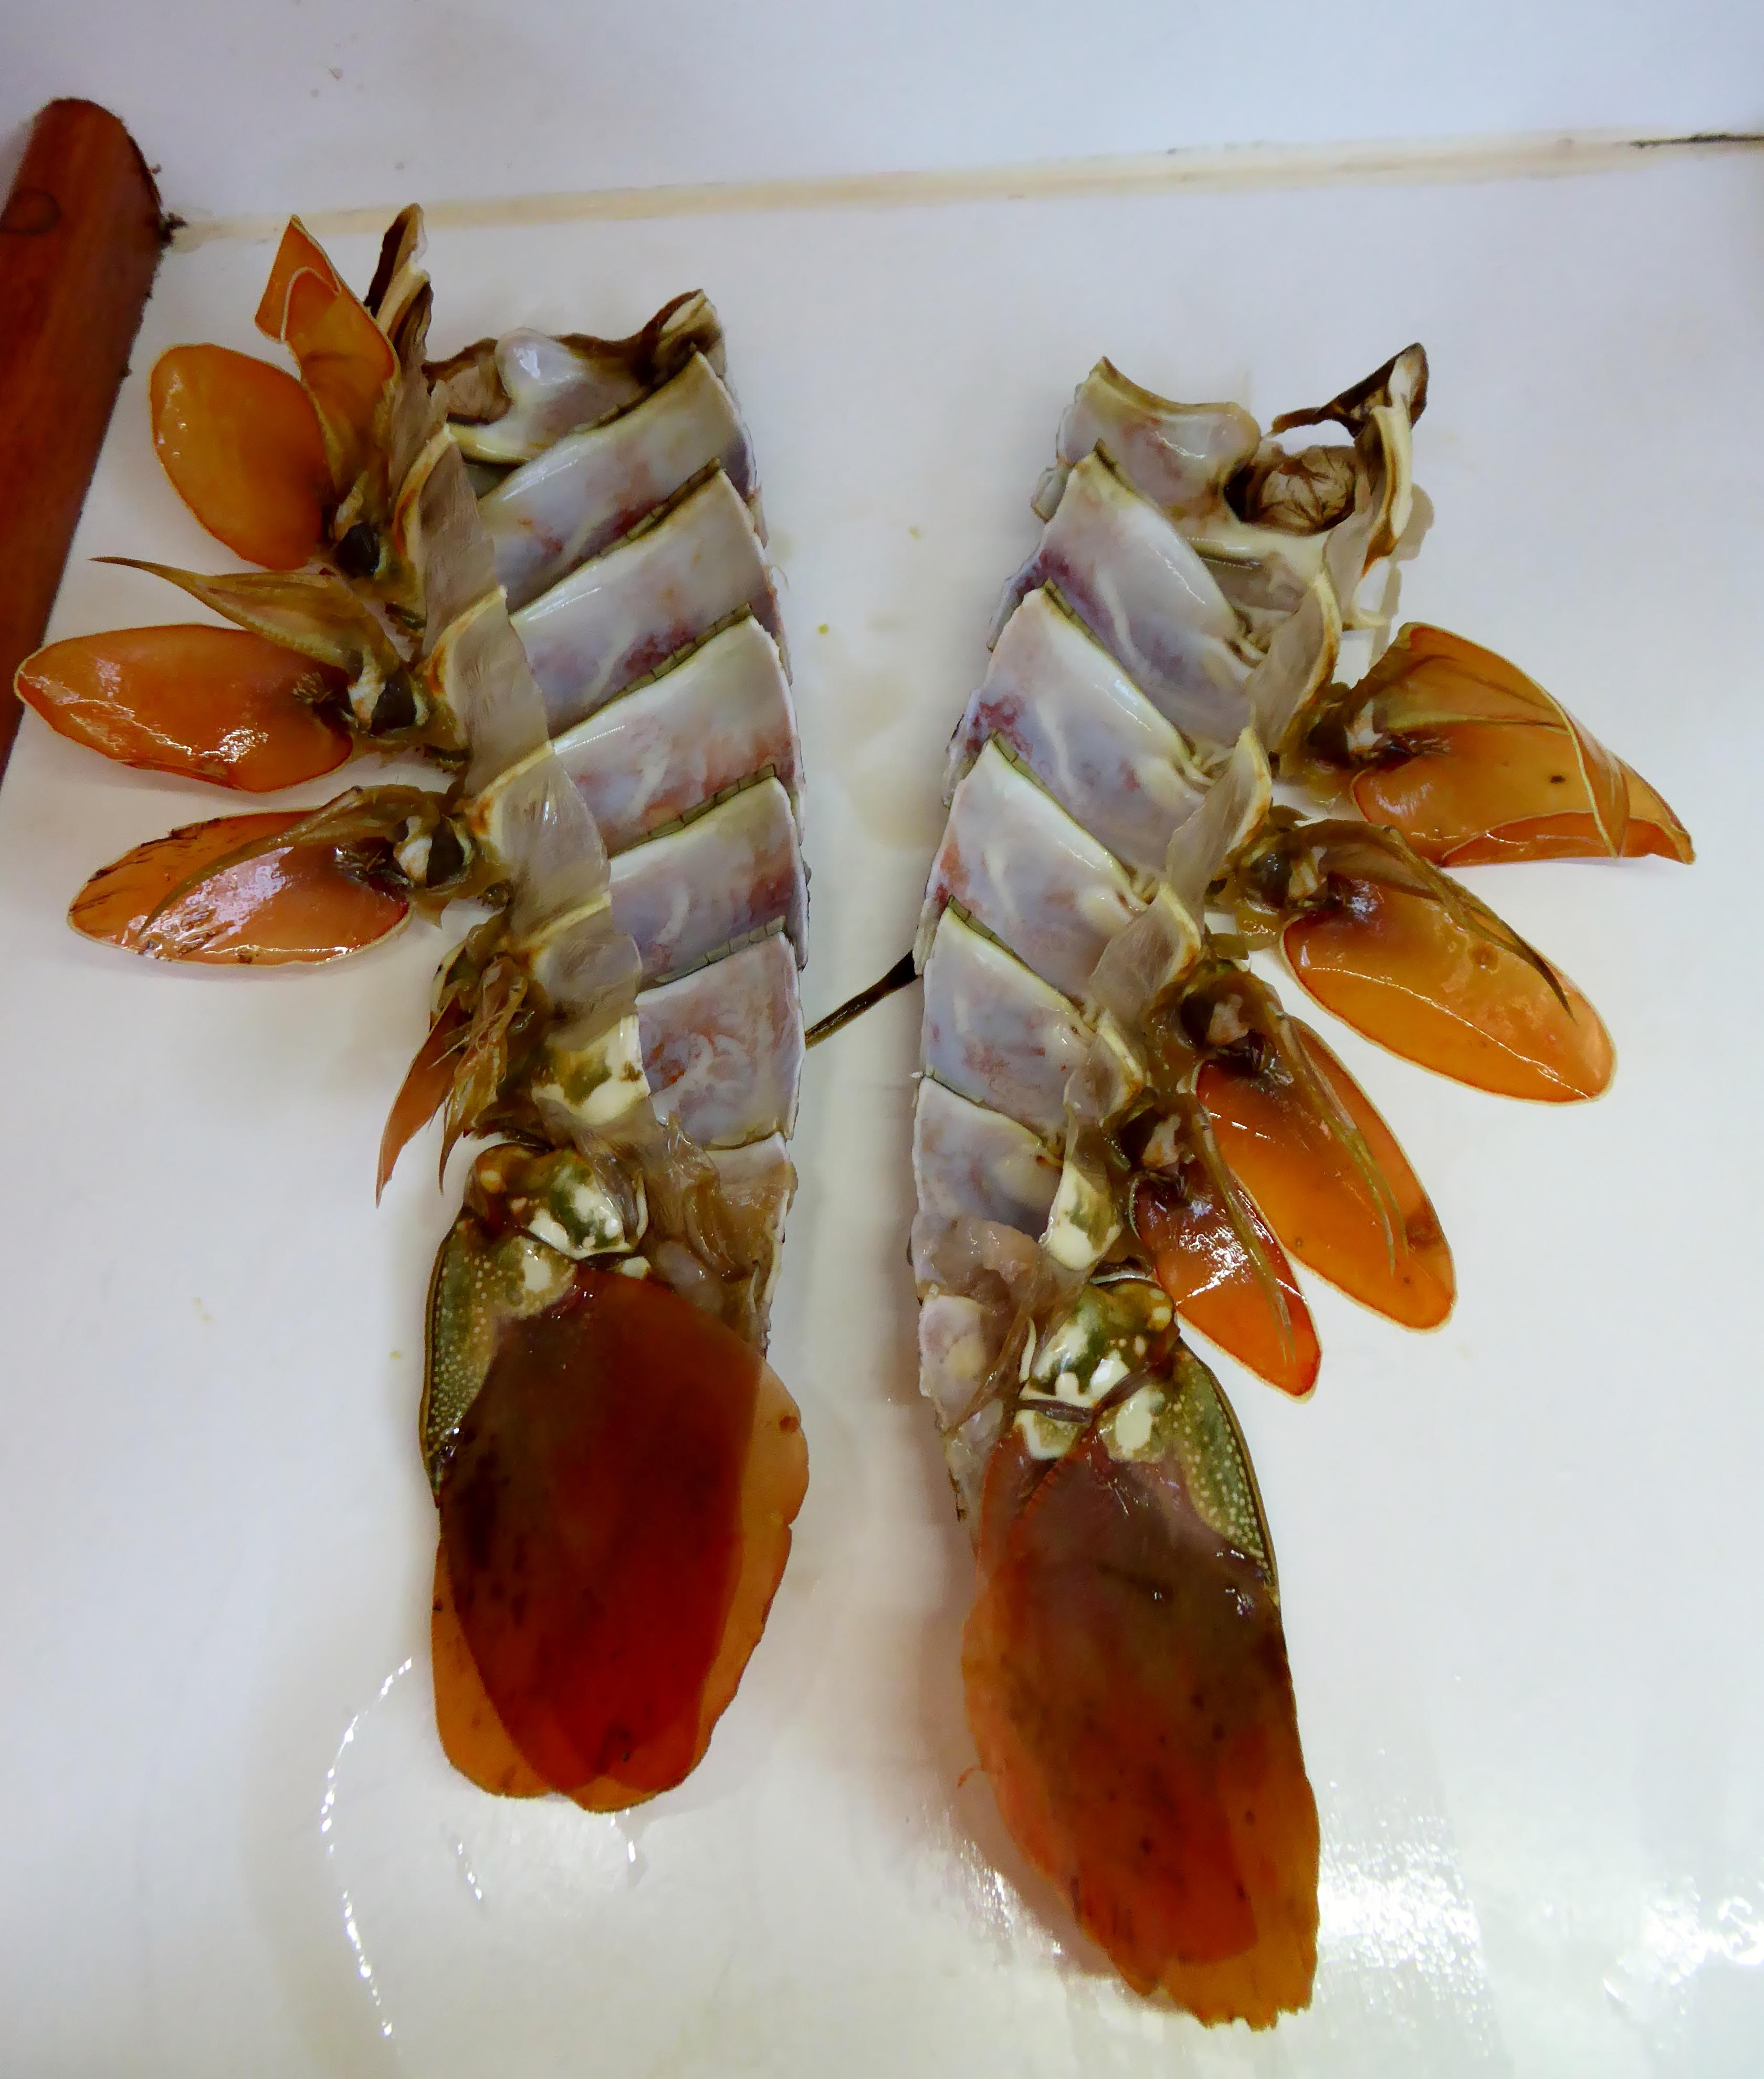 Crayfish Mornay - the empty shells